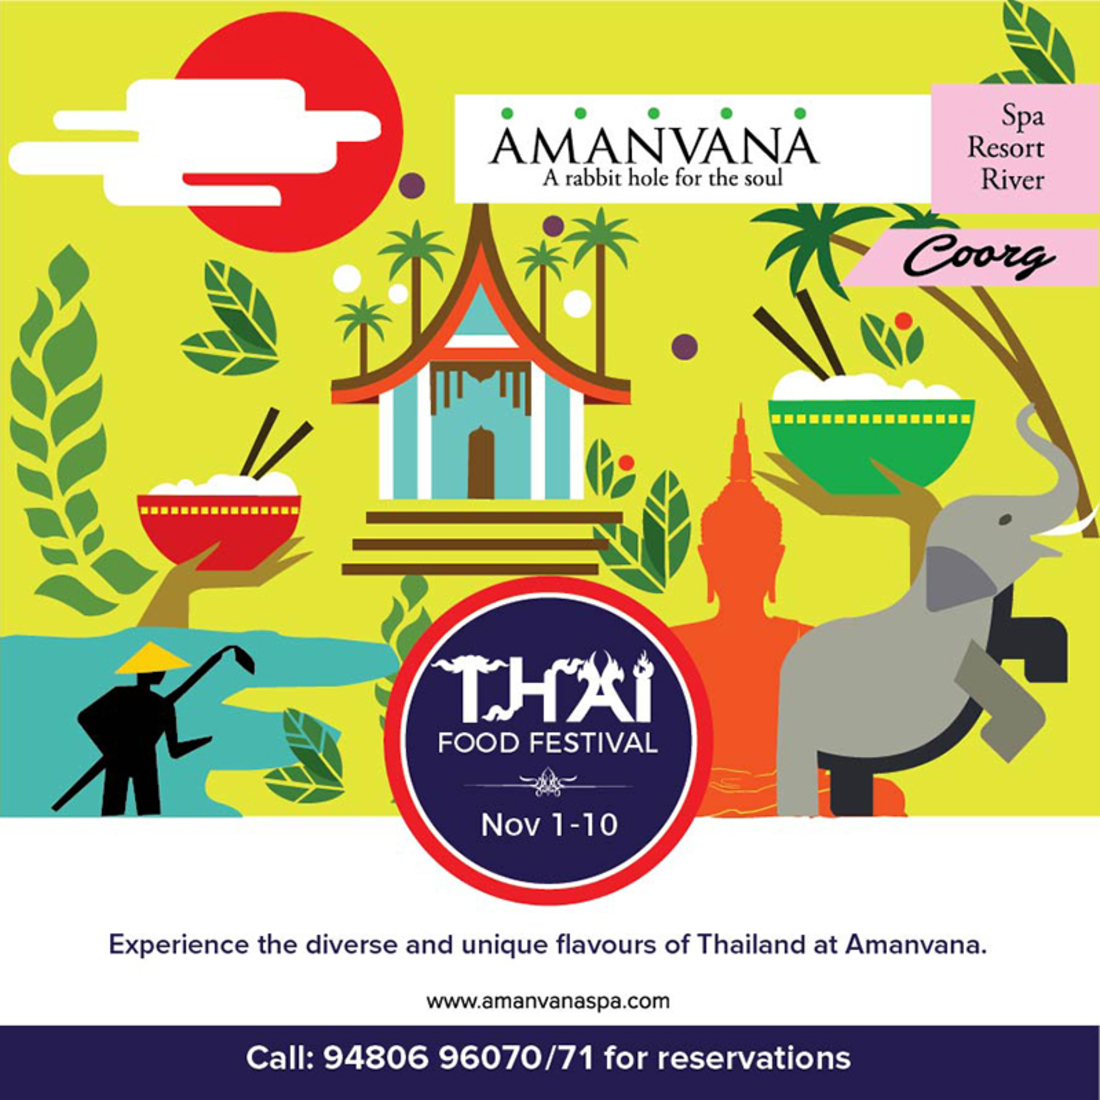 Amanvana Resort and Spa Coorg